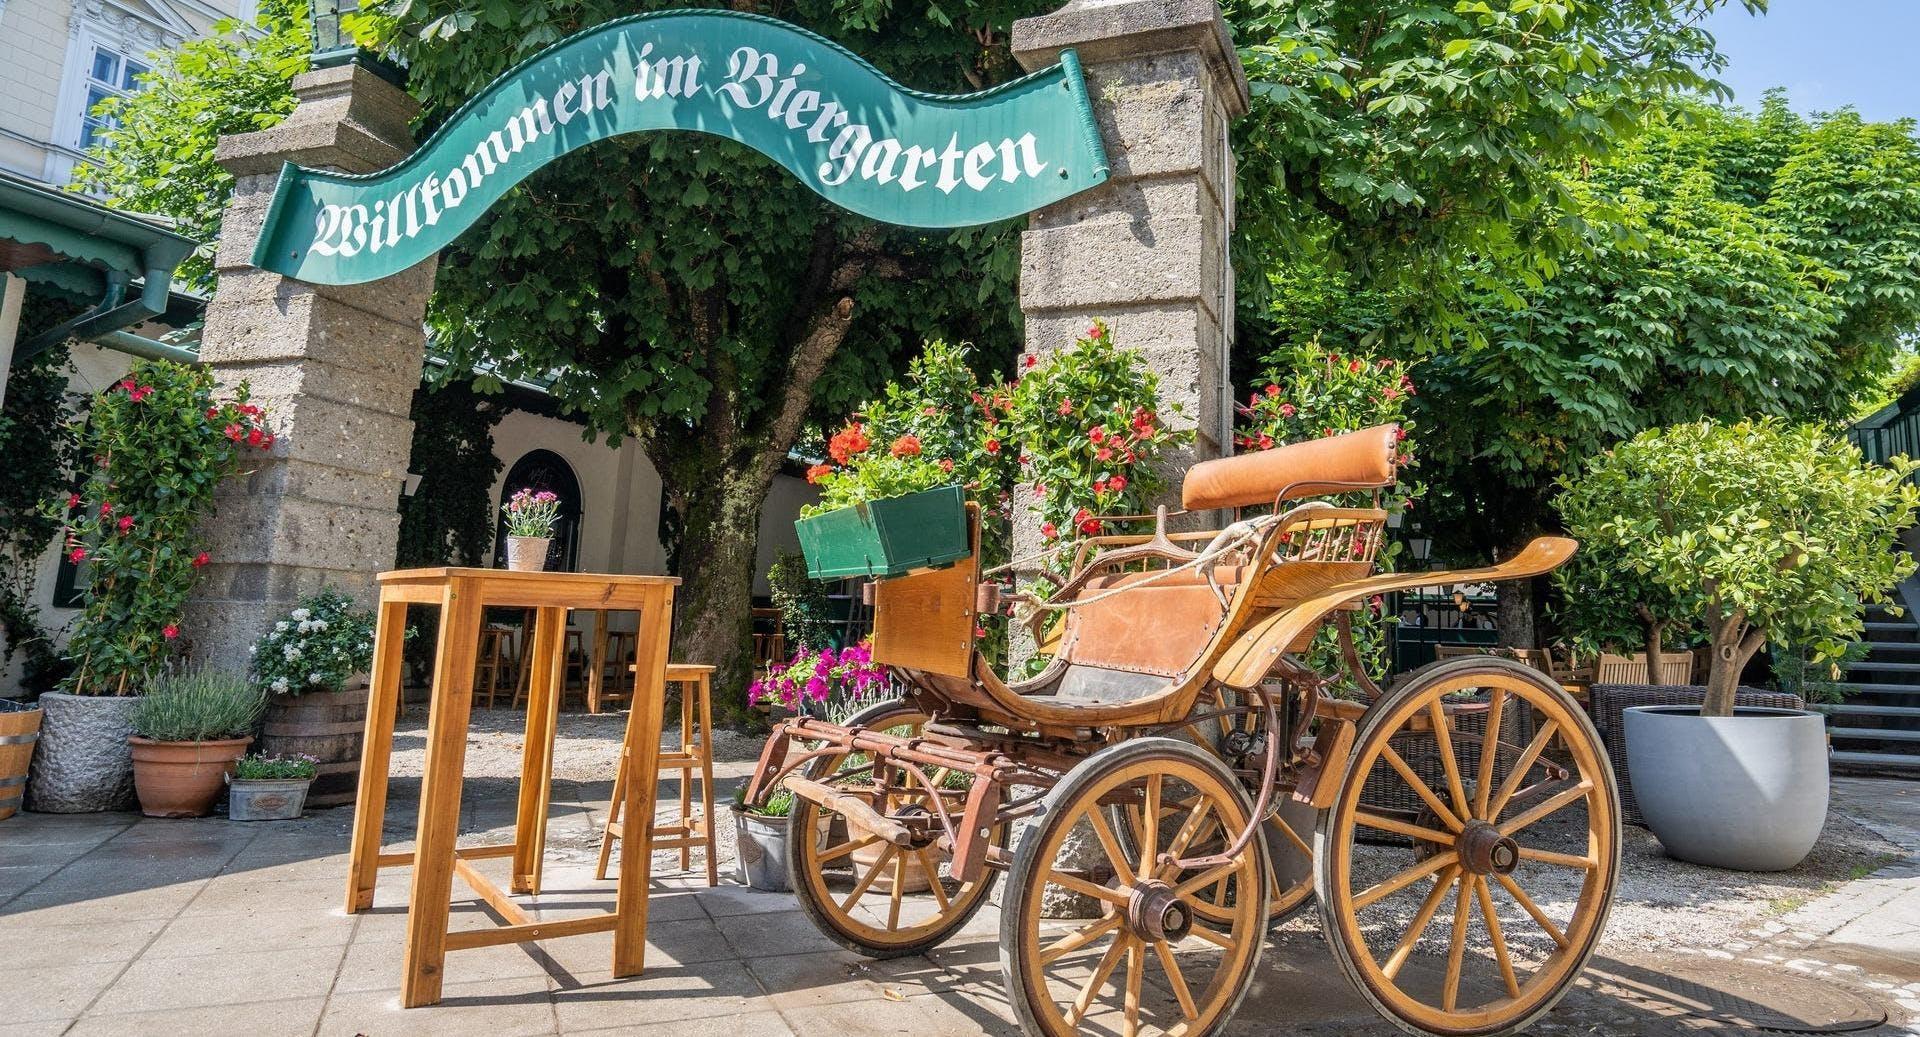 Stiegl-Klosterhof